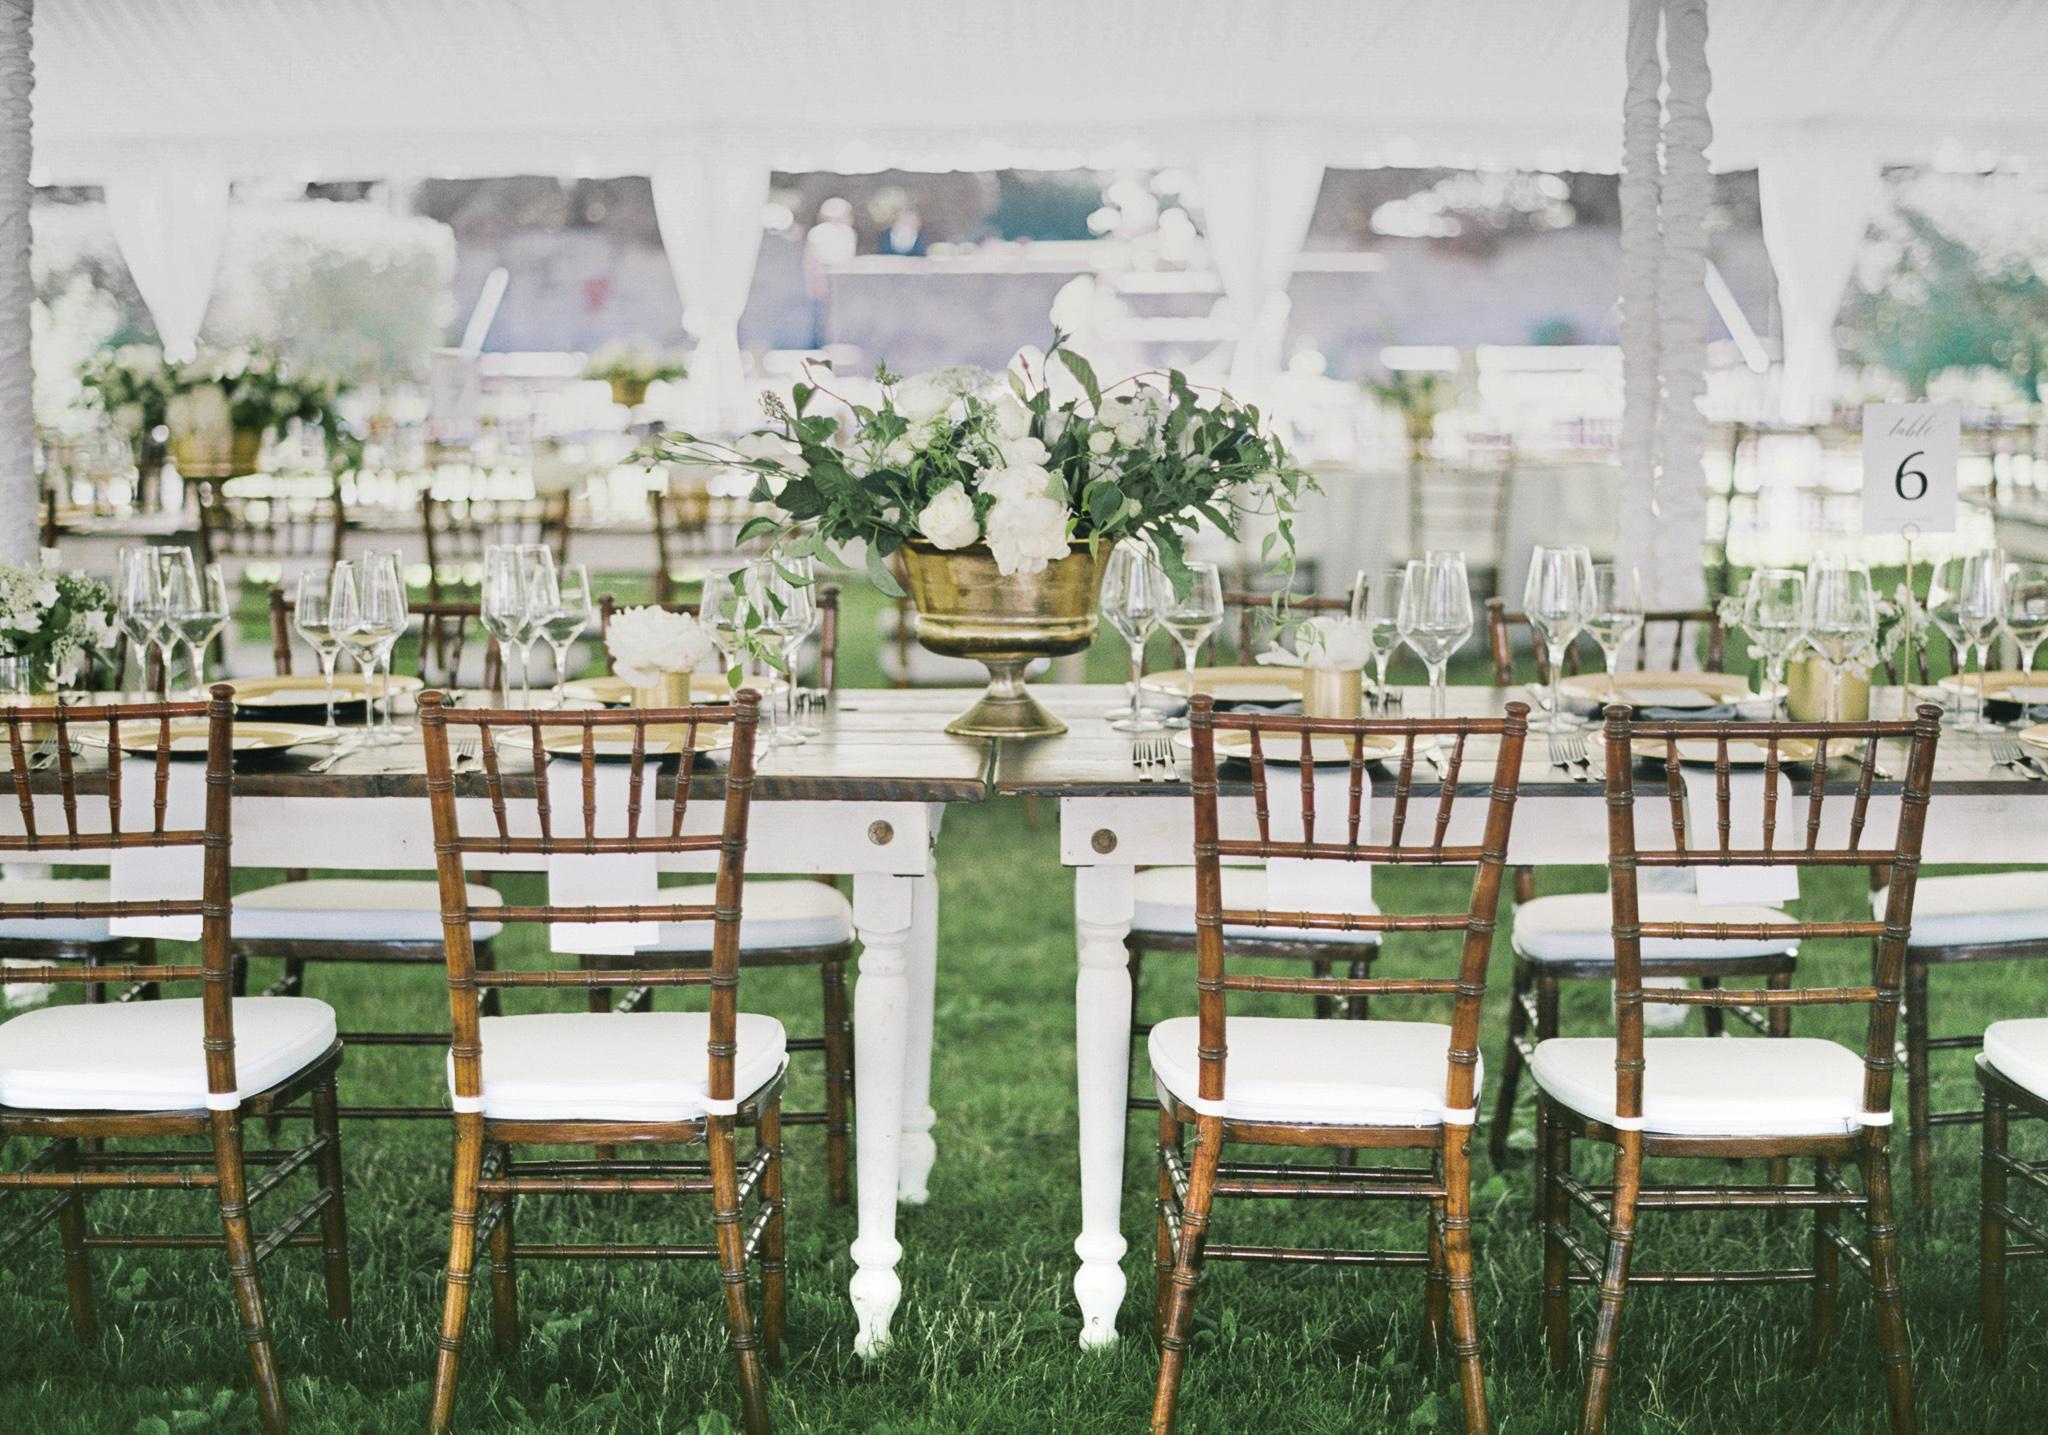 174OutliveCreative_Travel_Photographer_Videographer_Lewis&Clark_Oregon_Elegant_BlackTie_Destination_Wedding.jpg